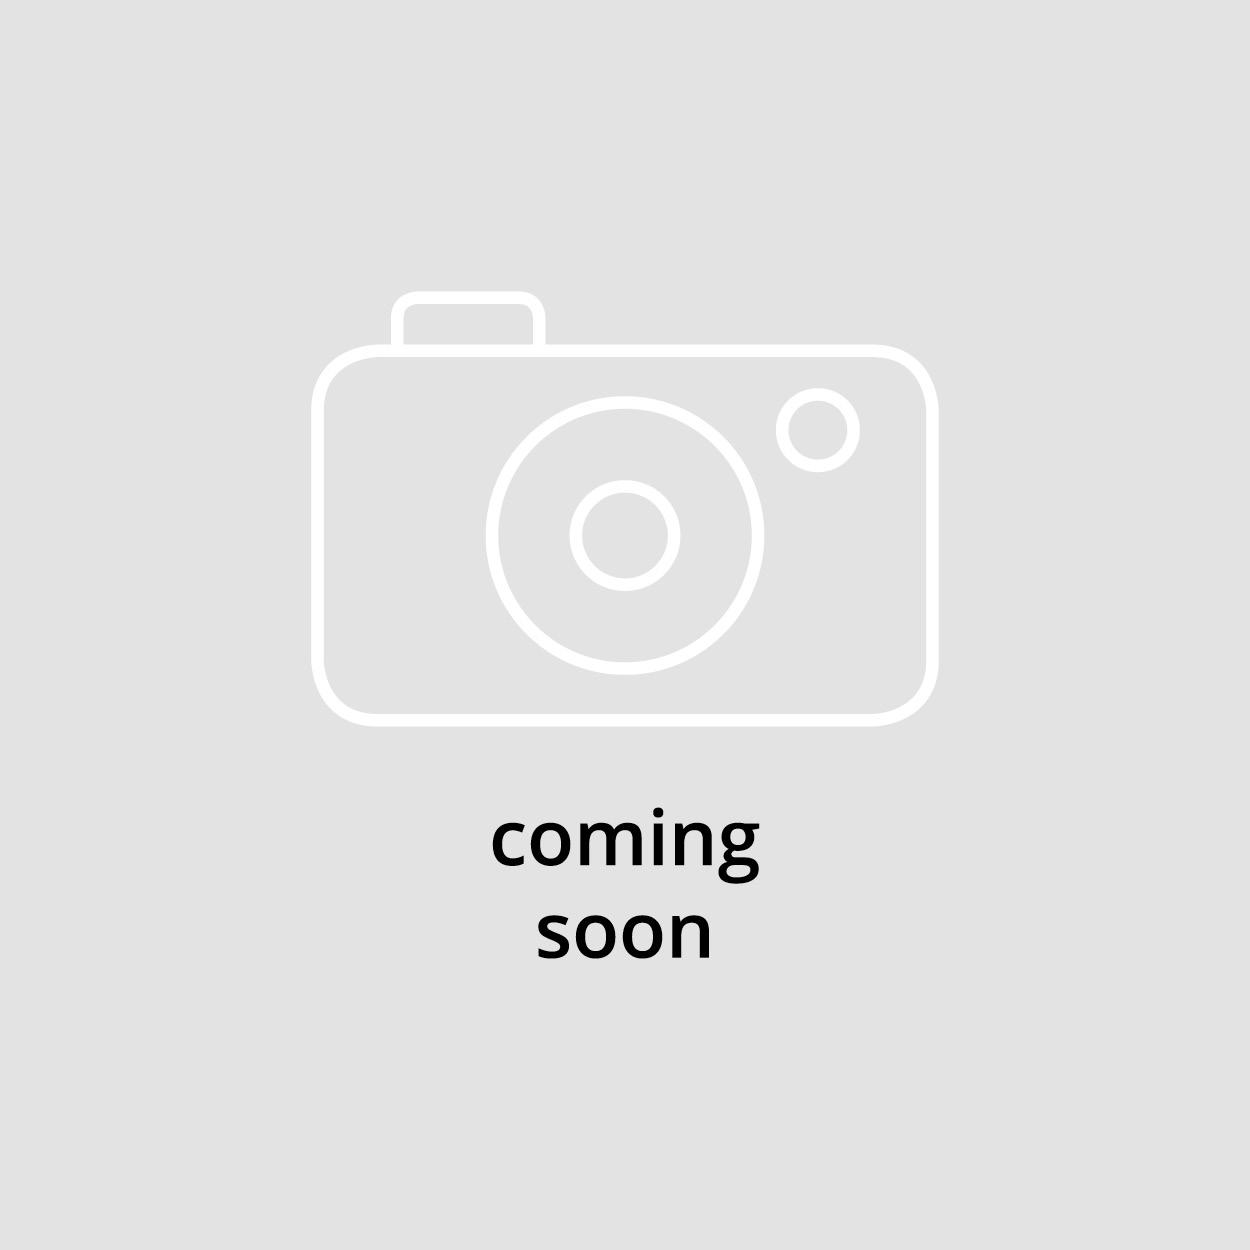 Calibro con orologio, cinquantesimale/ventesimale Serie MicroMet